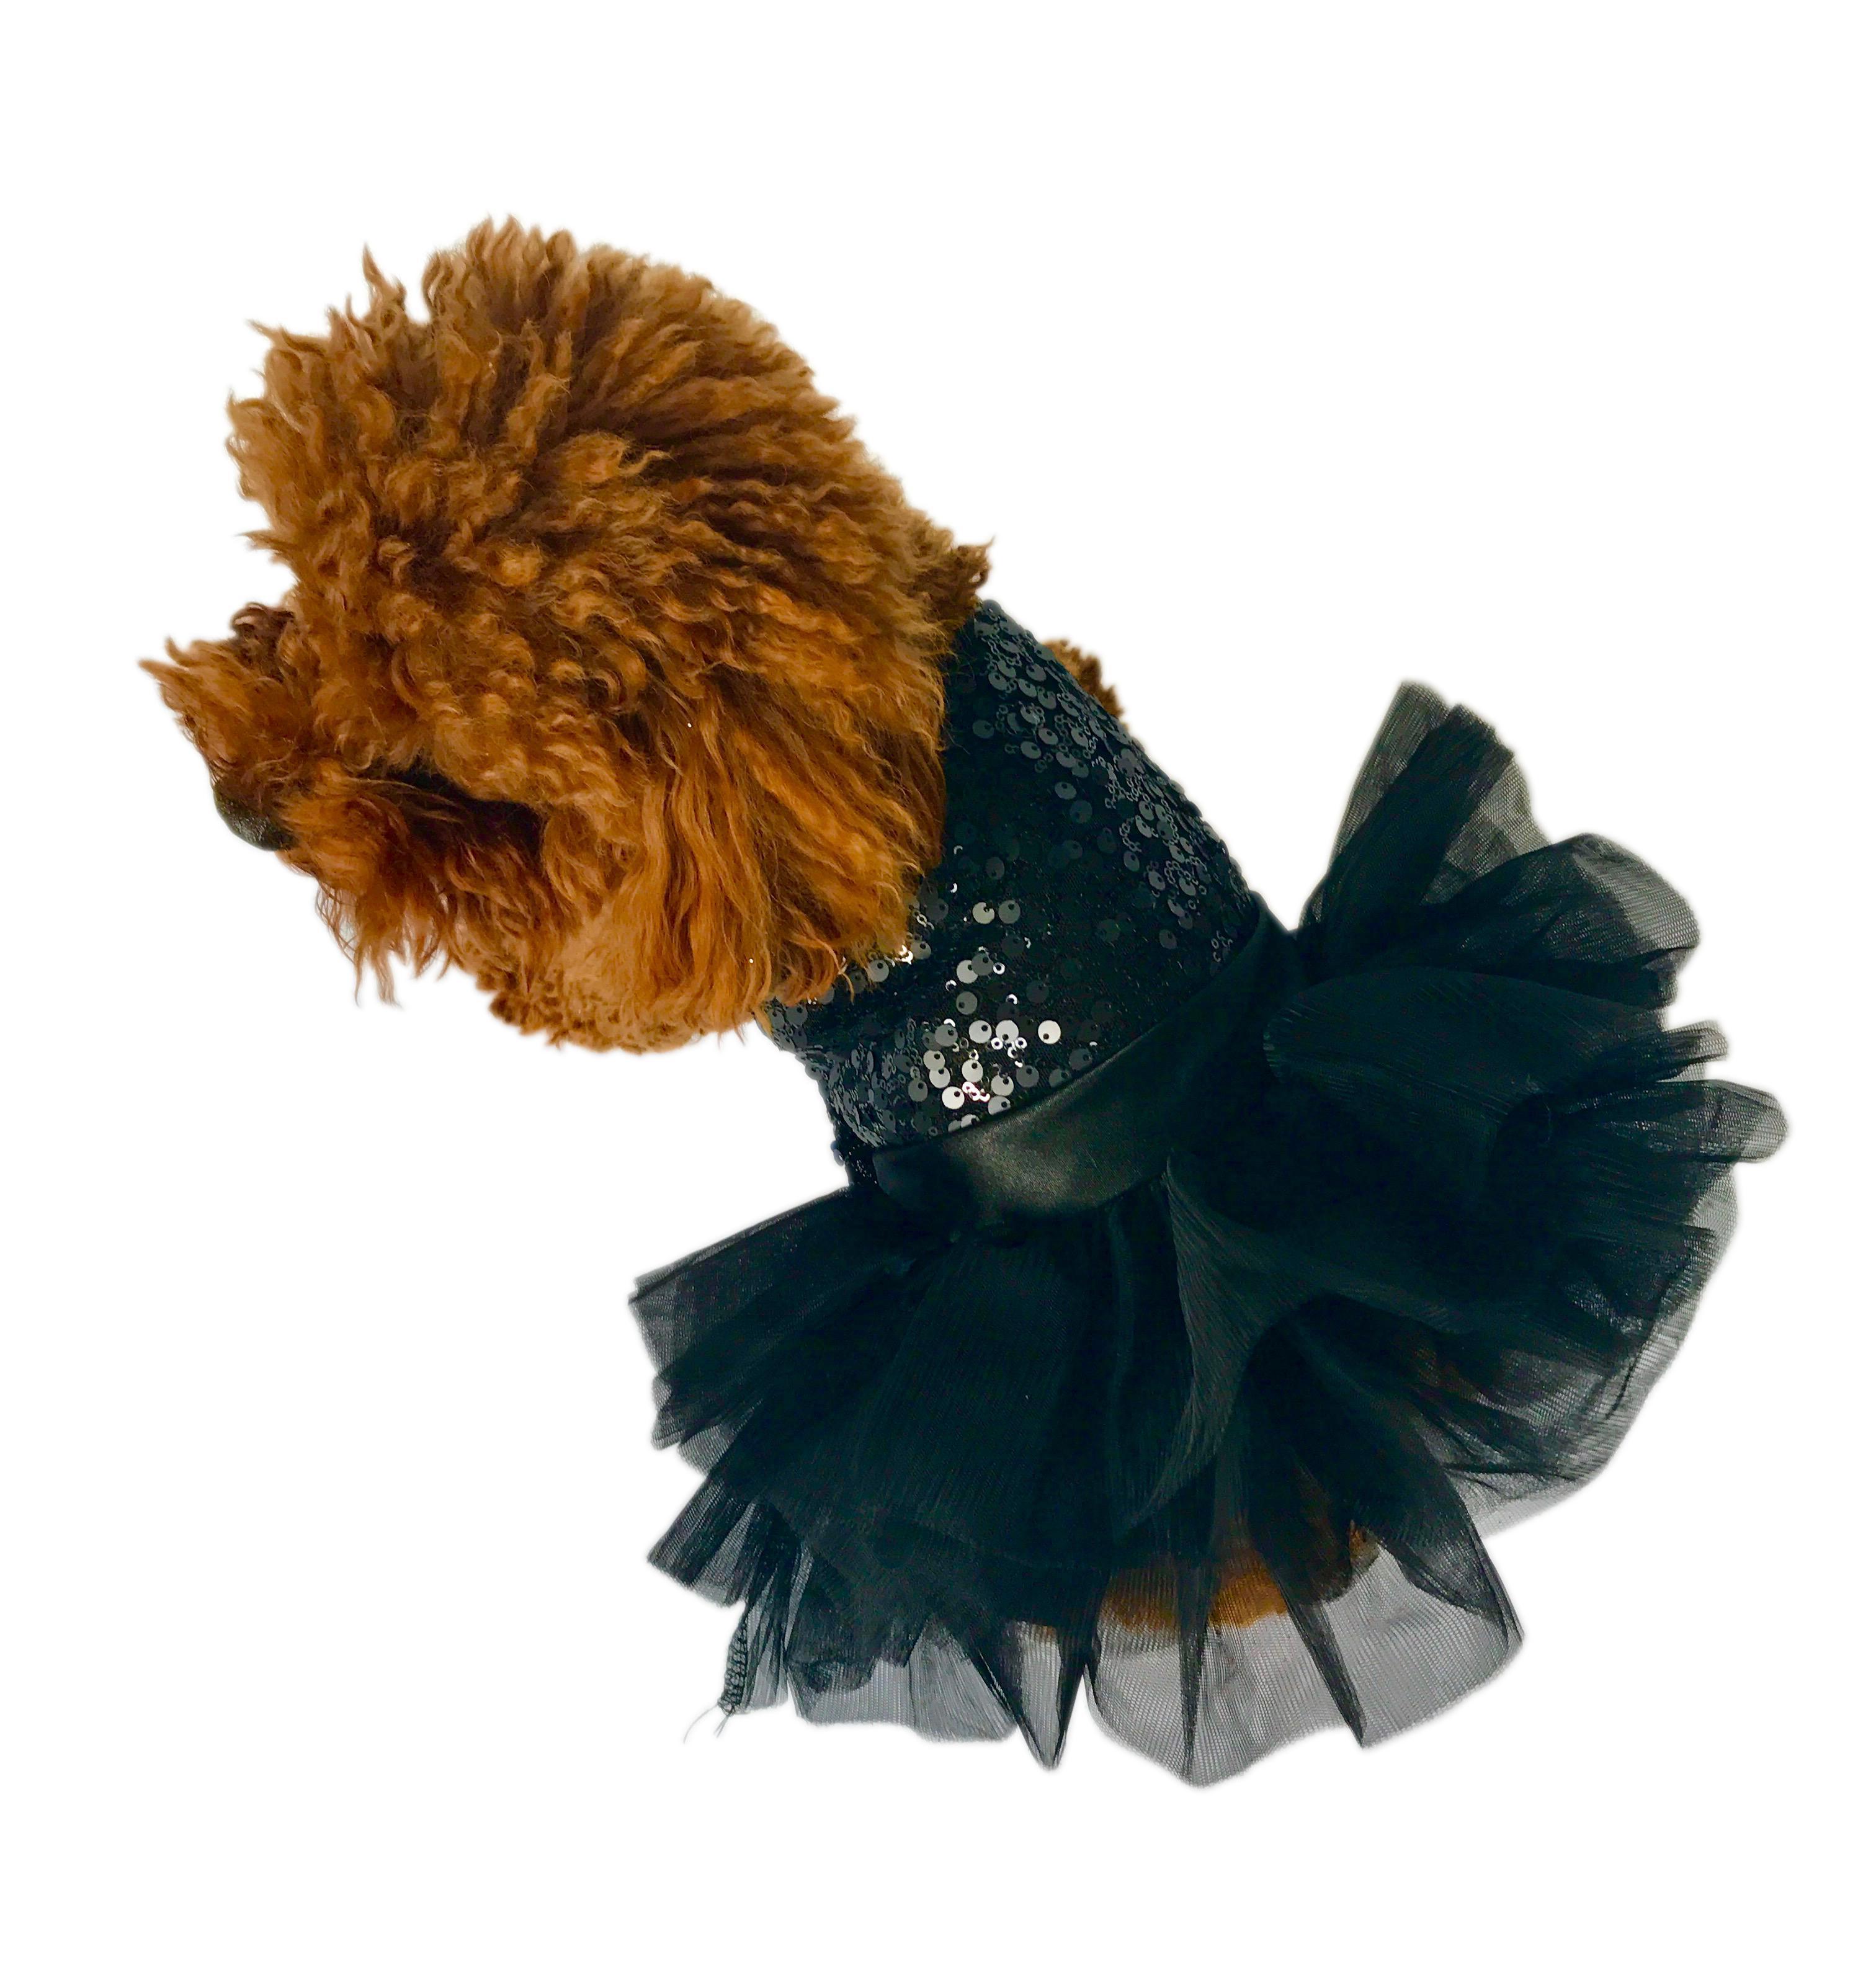 Marilyn Sequin Fufu Tutu Dog Dress - Black